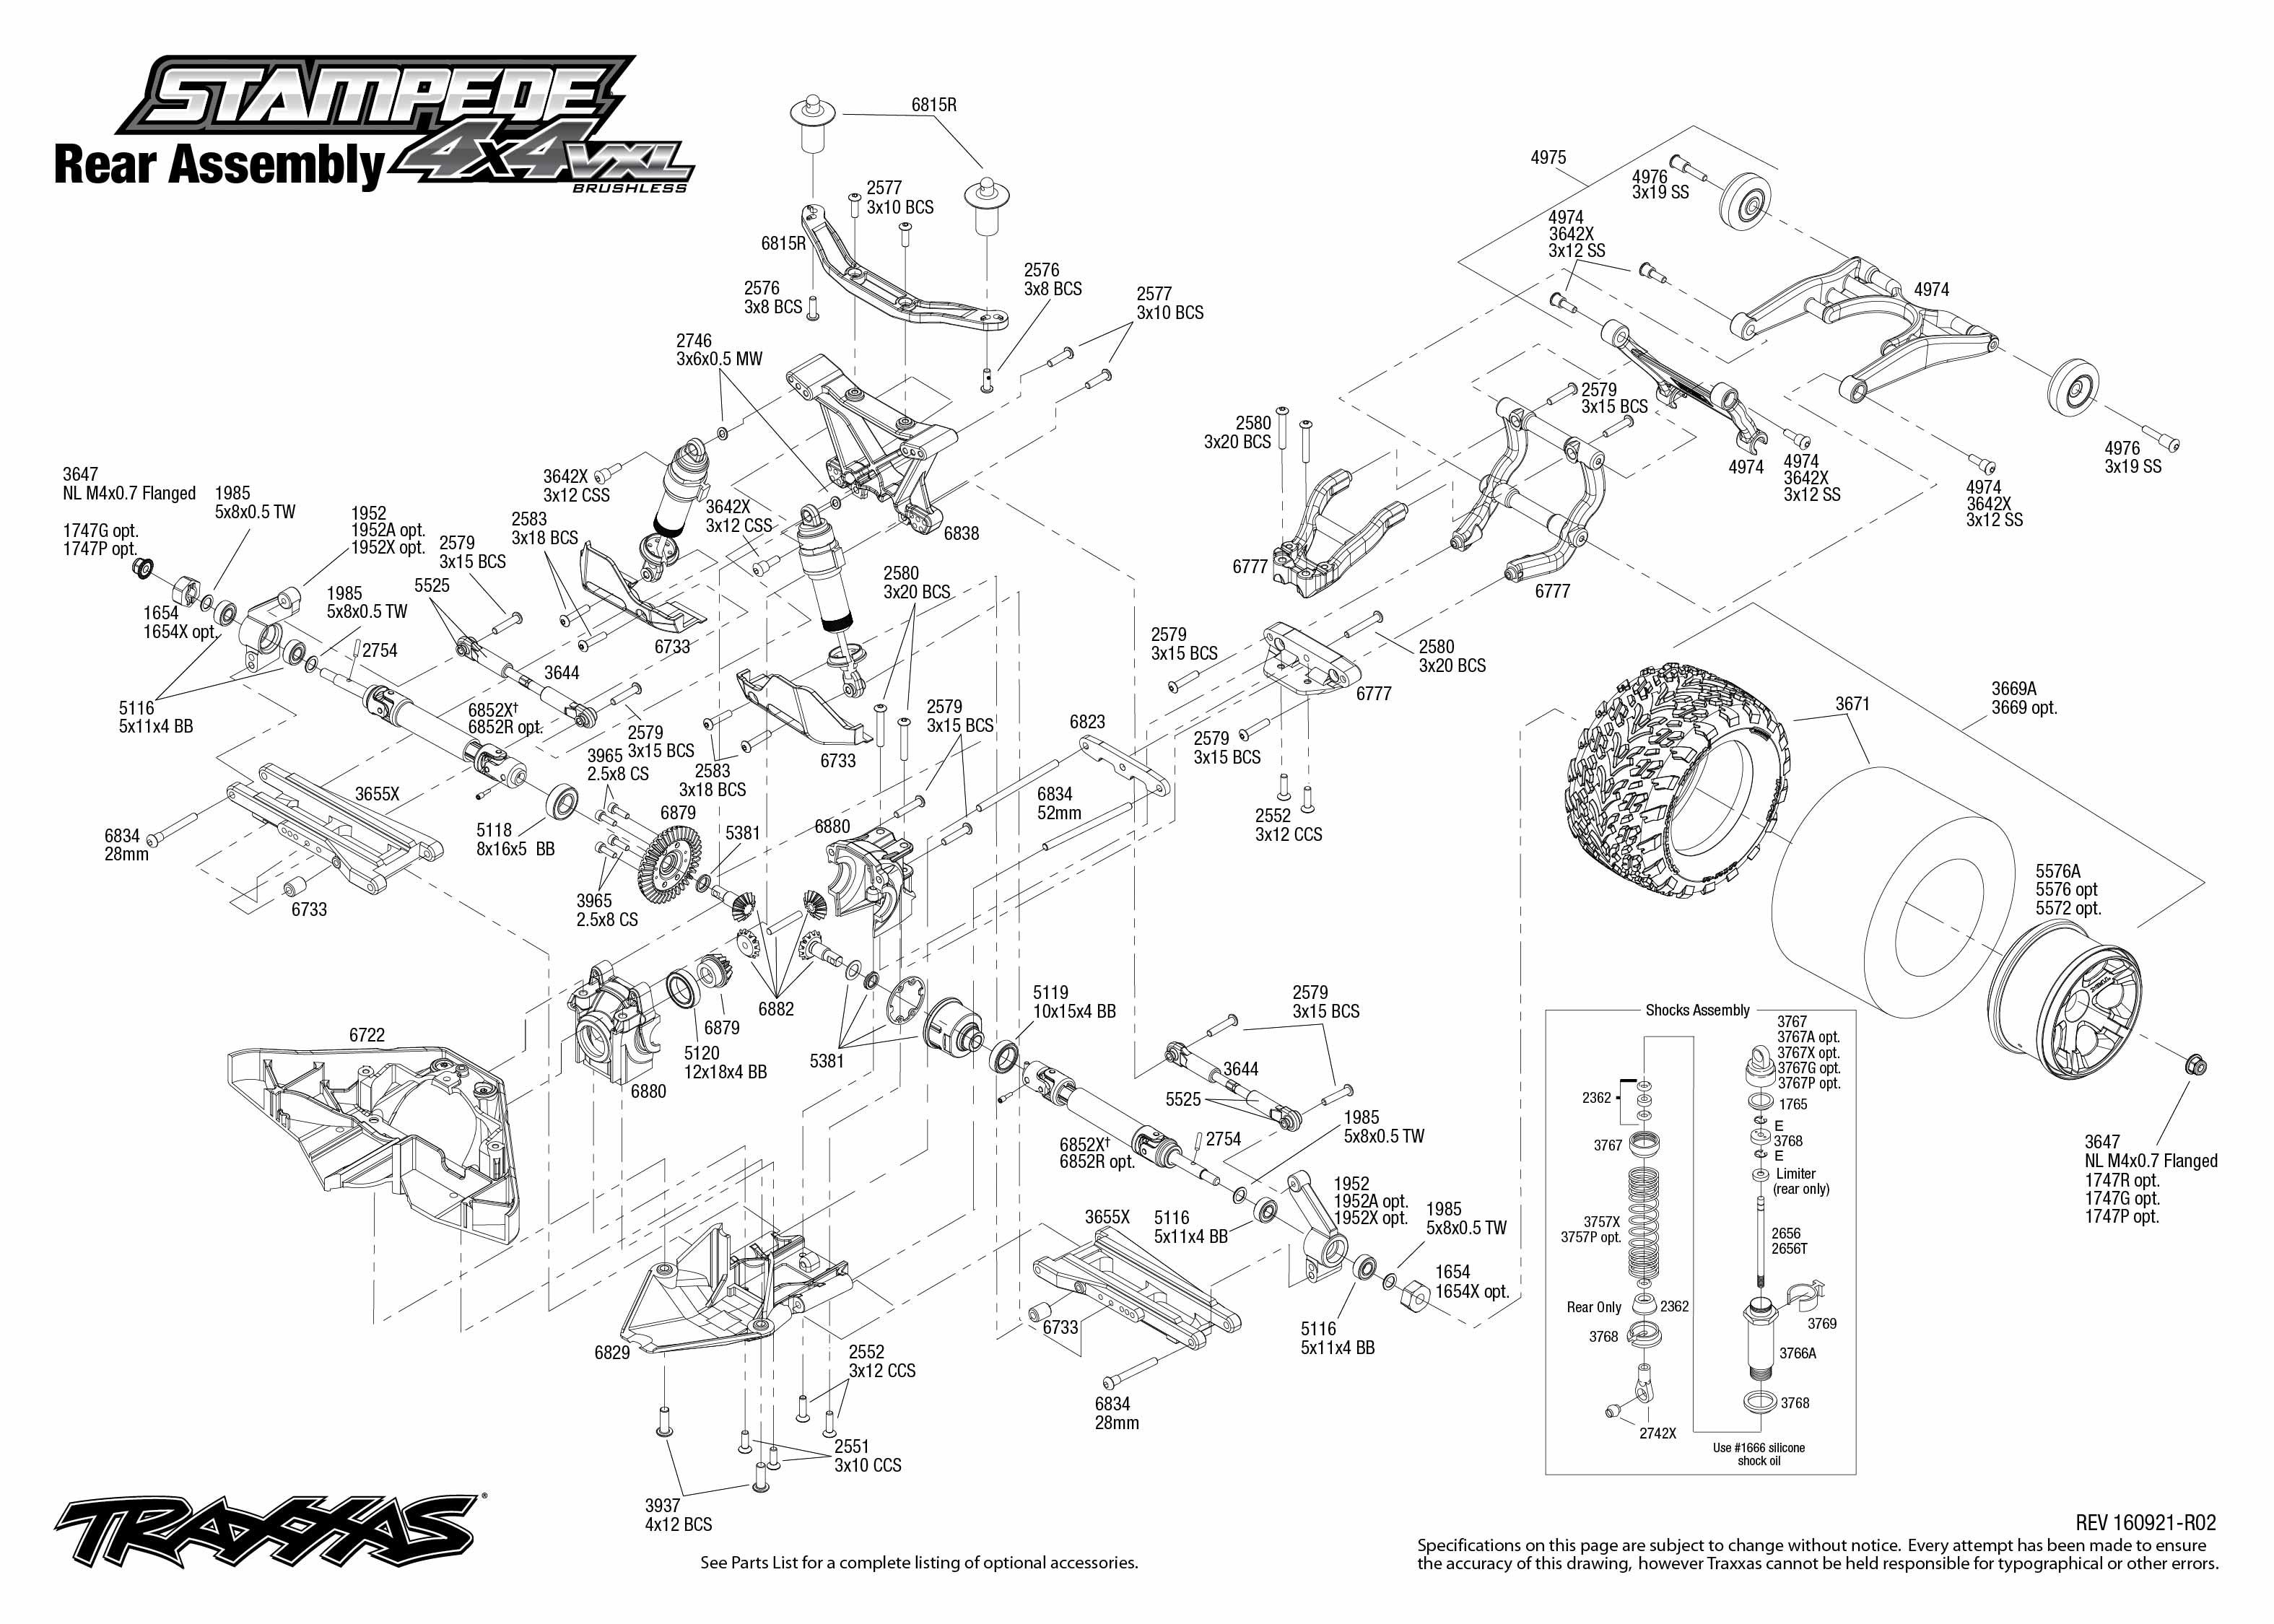 Traxxas Stampede Motor Diagram Schematic Diagrams Additionally Slash 4x4 Slipper Clutch On Parts Wiring U2022 Summit Exploded